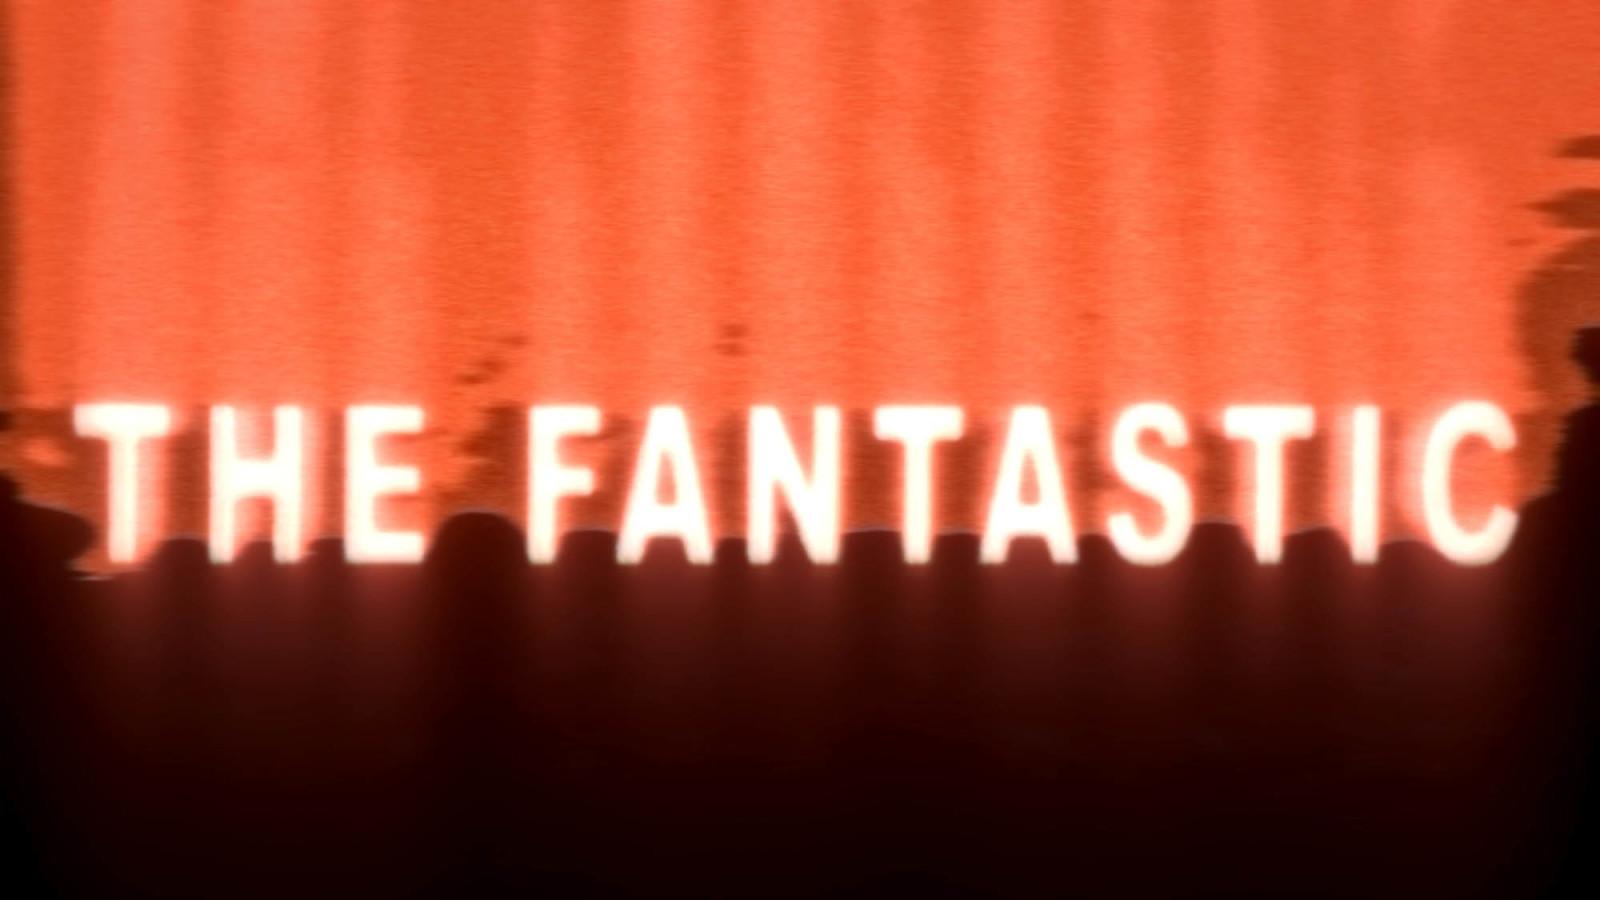 TheFantastic